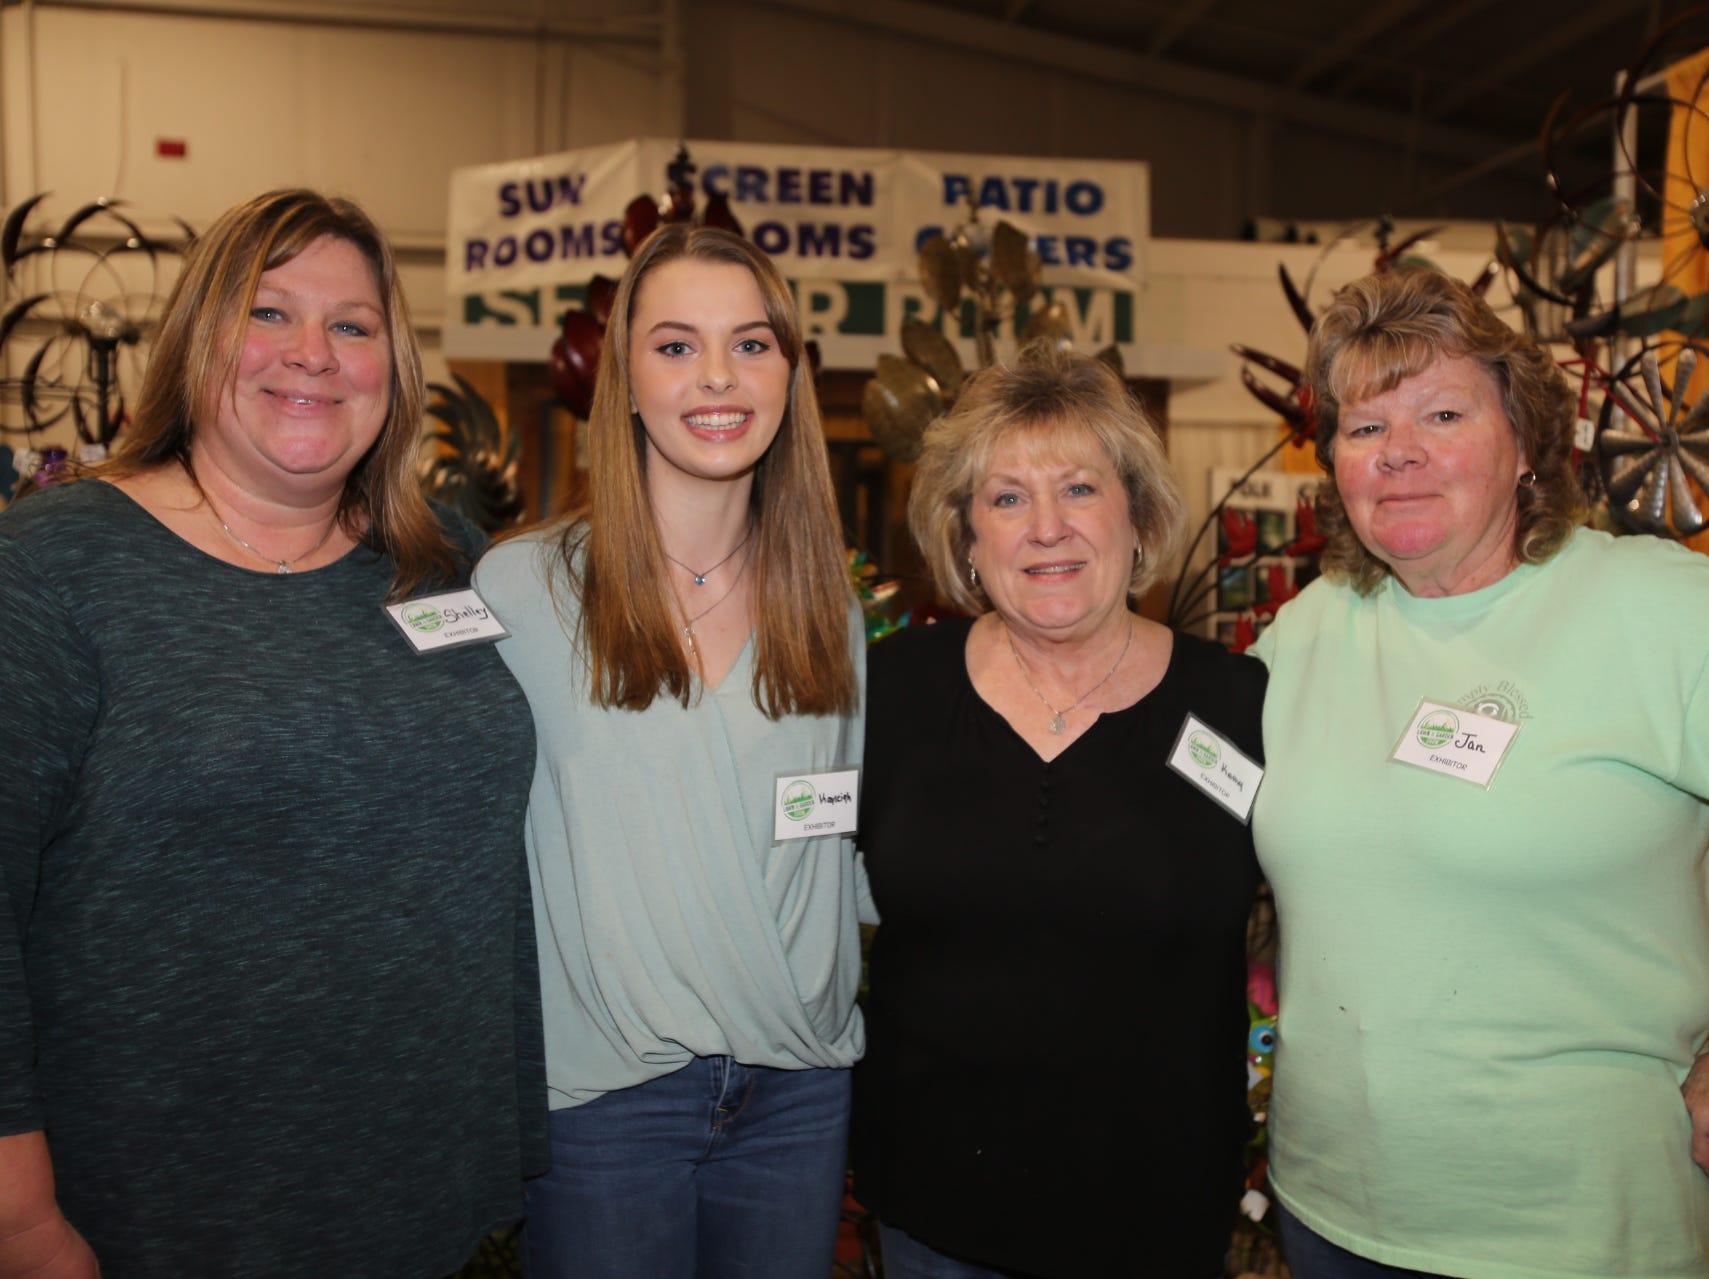 Shelley and Kayleigh Girth, Kathy Phelps, and Jan Markle